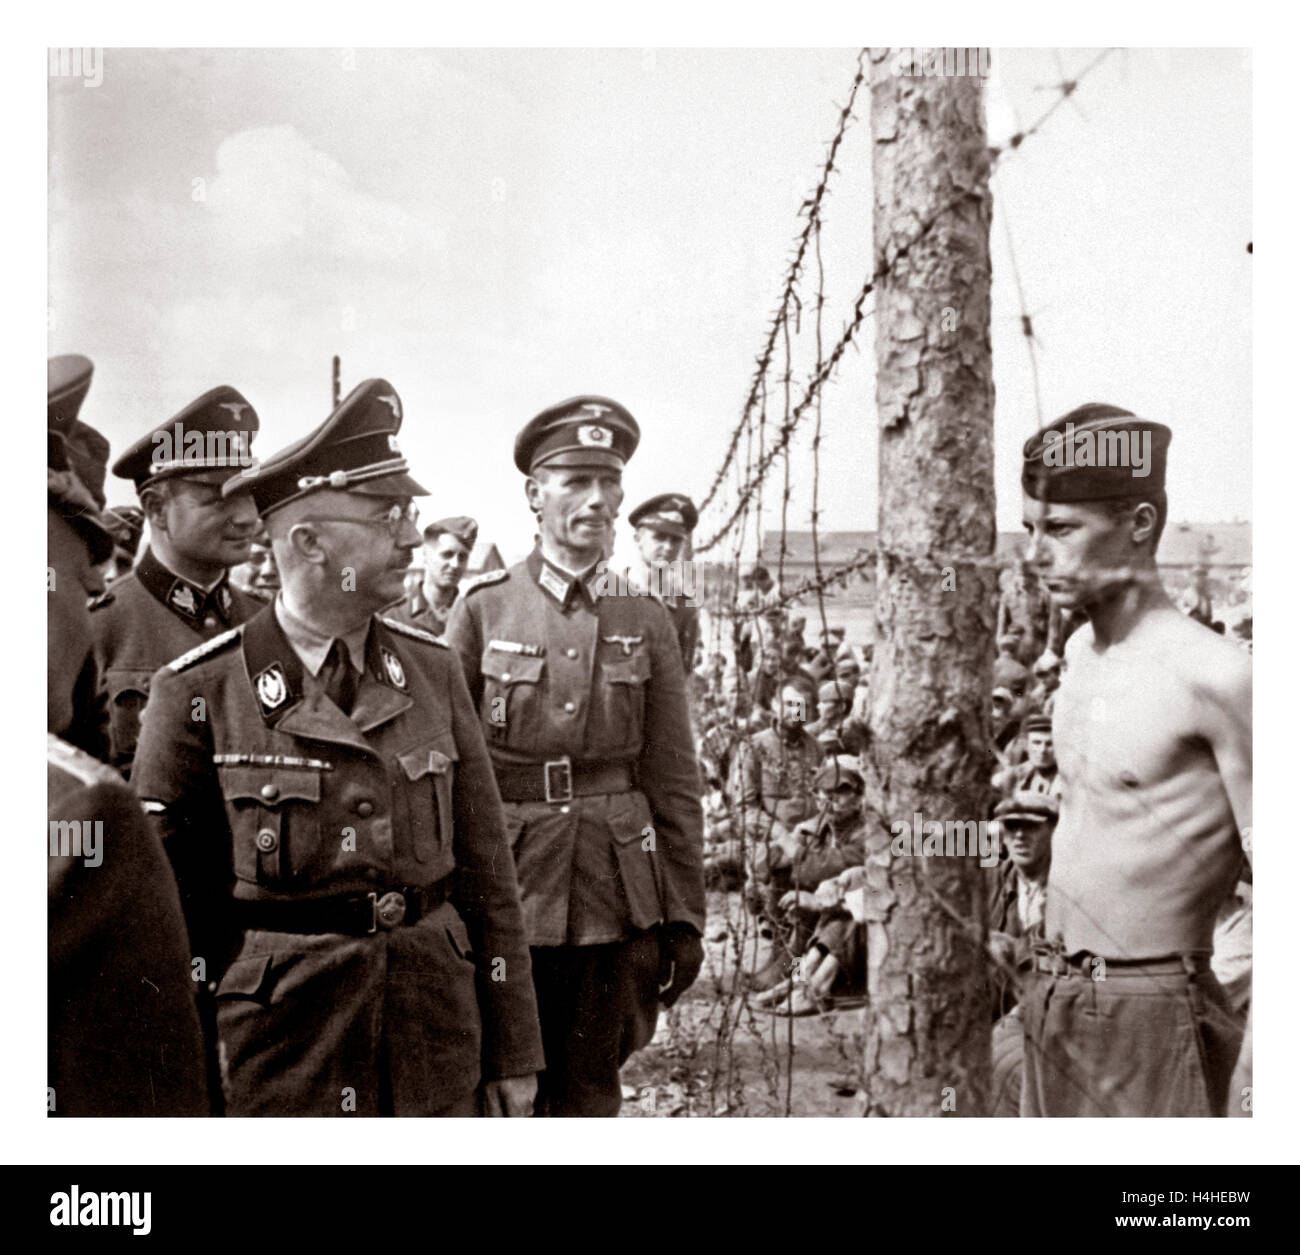 German Nazi Leader Heinrich Himmler In Uniform Inspects A